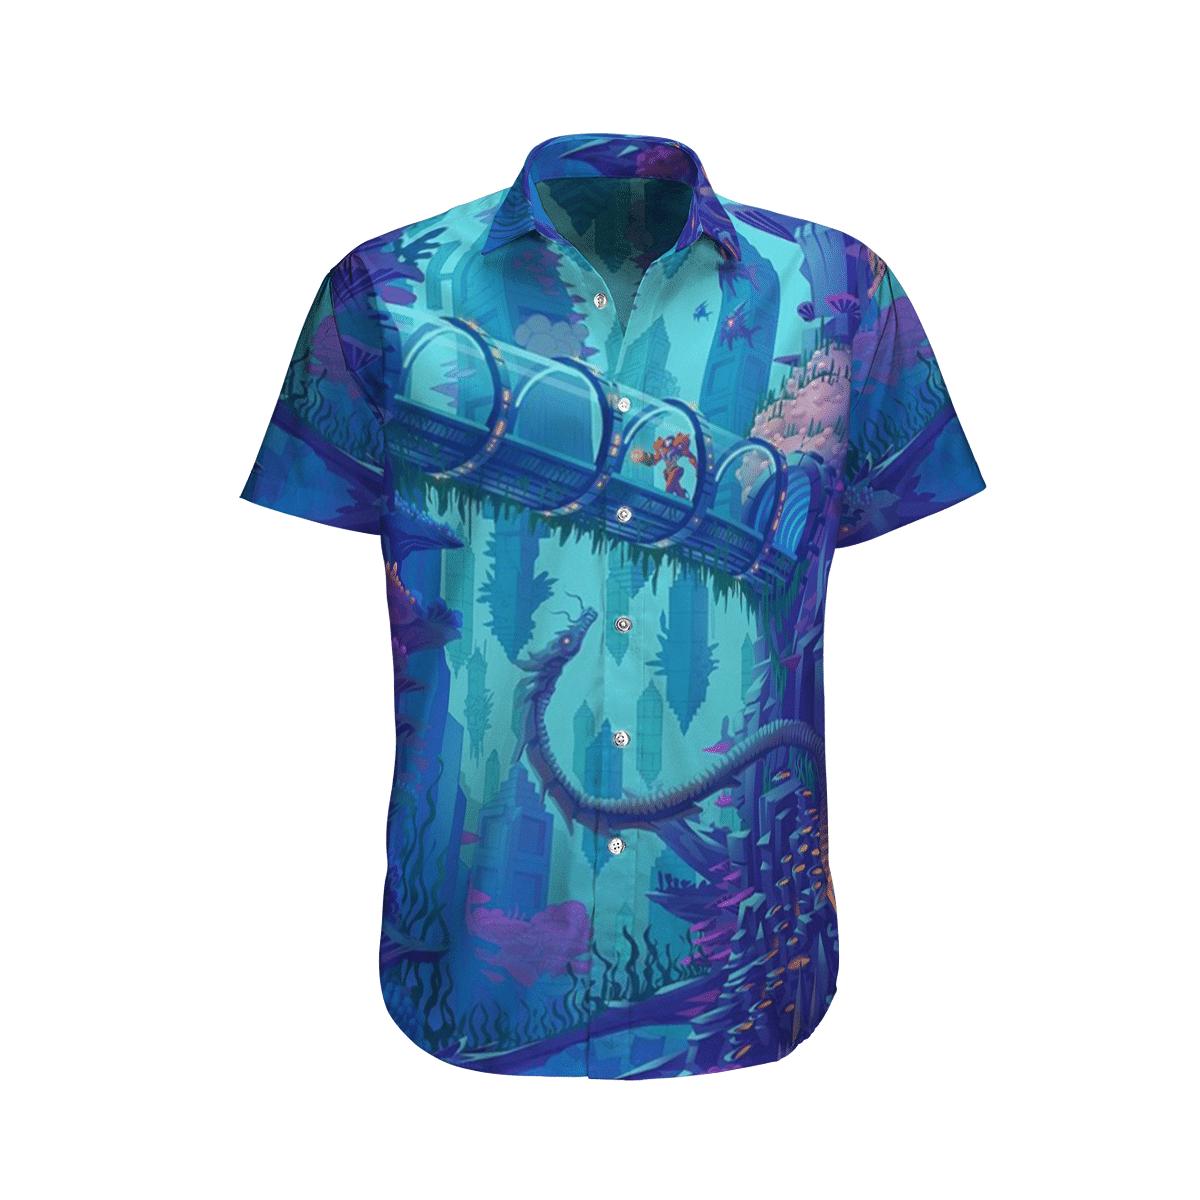 Metroid Prime Blue in the ocean Hawaiian Shirt